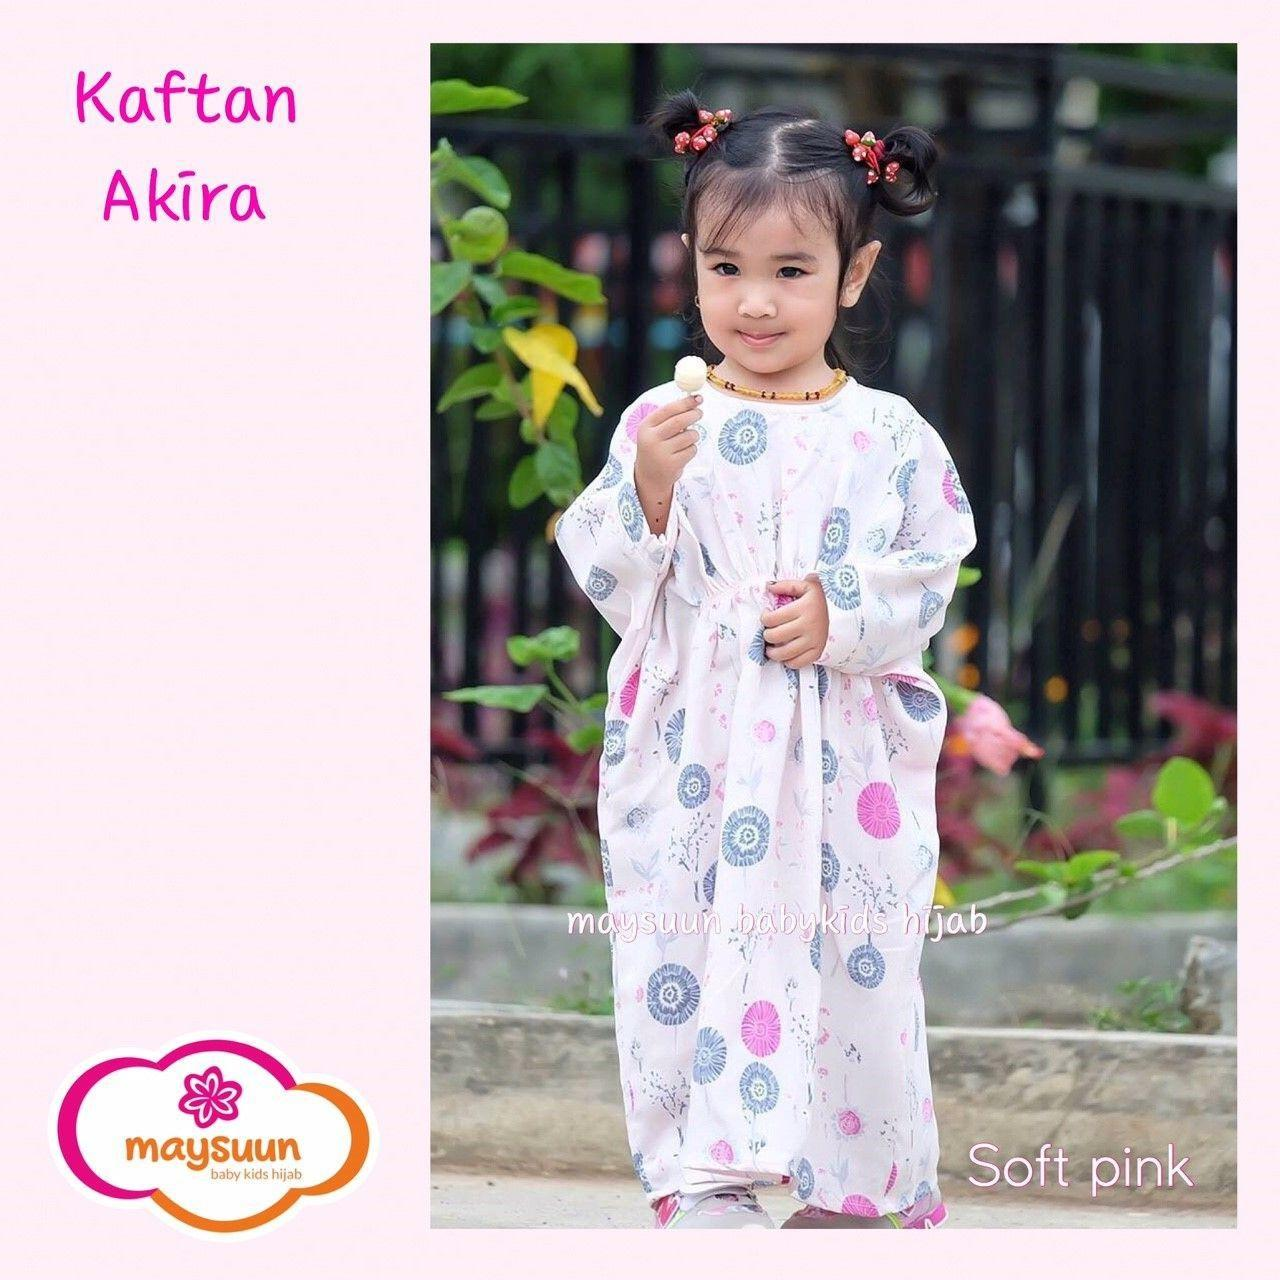 Fairuz Hijab, TERMURAH !!, Kaftan Anak Cewek Terbaru, Baju Muslim Anak Perempuan Lucu, Busana Muslim Anak Modern Warna Soft Pink